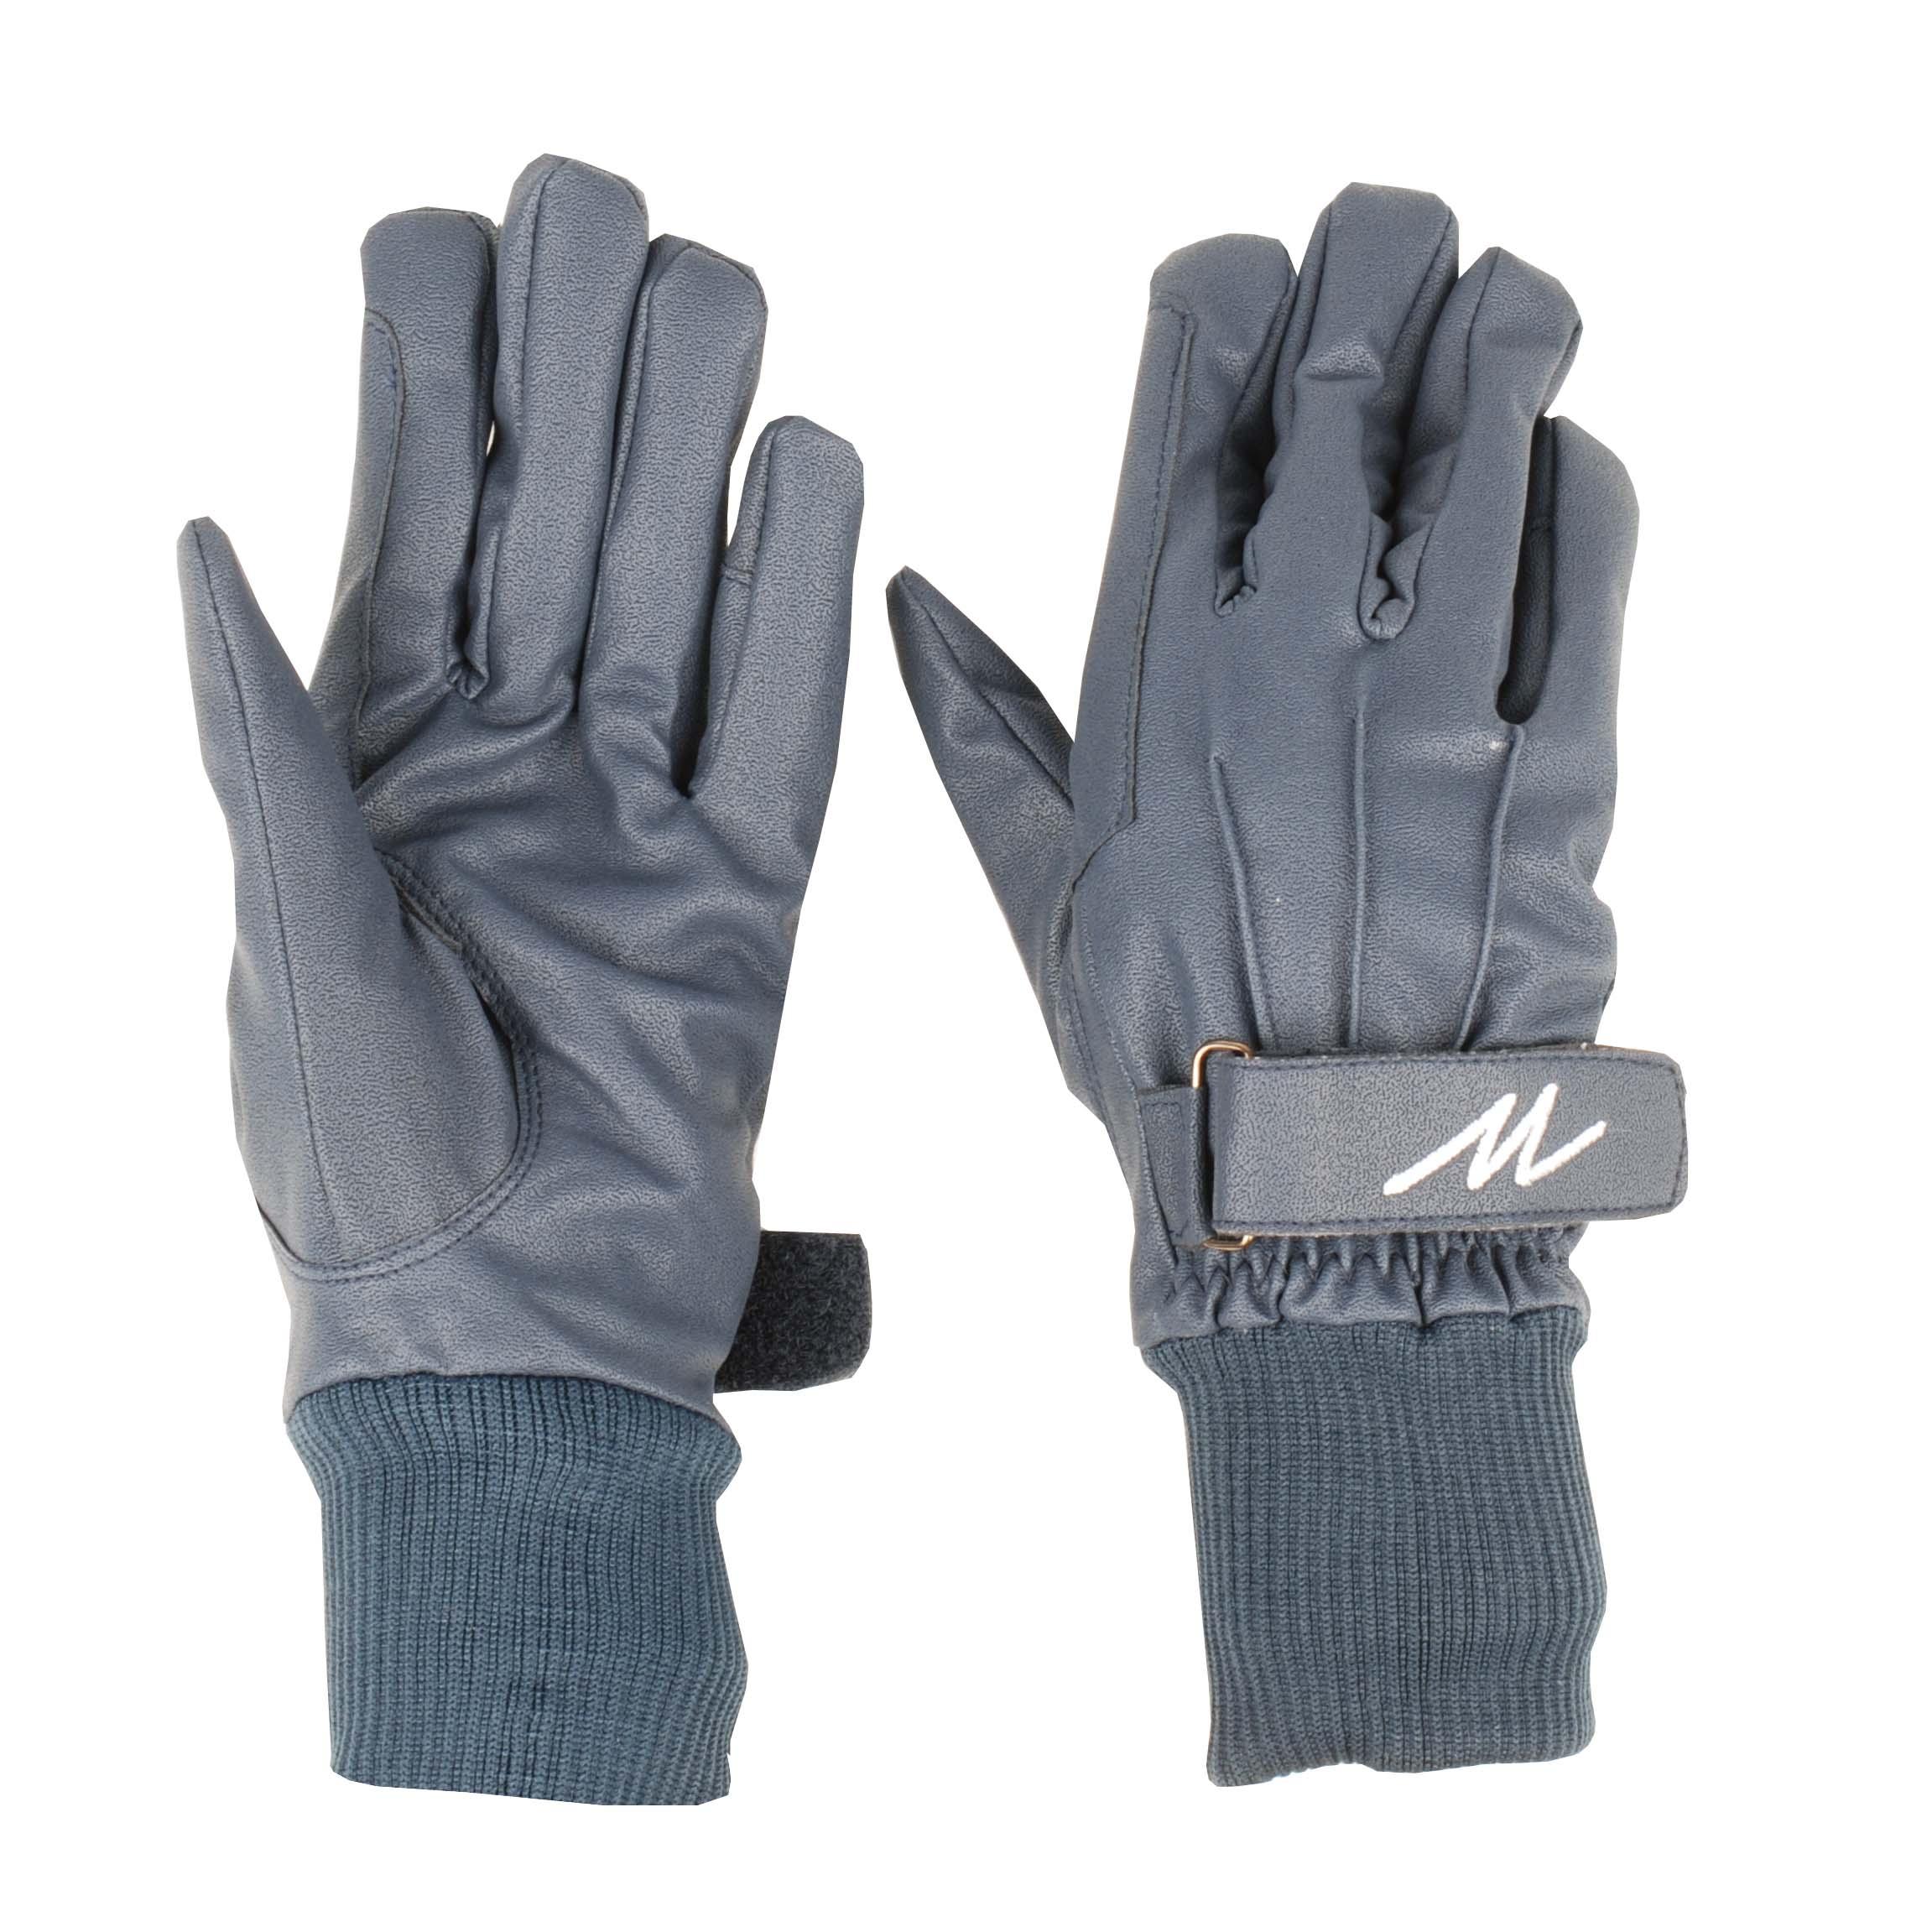 Mondoni Cordoba handschoenen donkerblauw maat:m